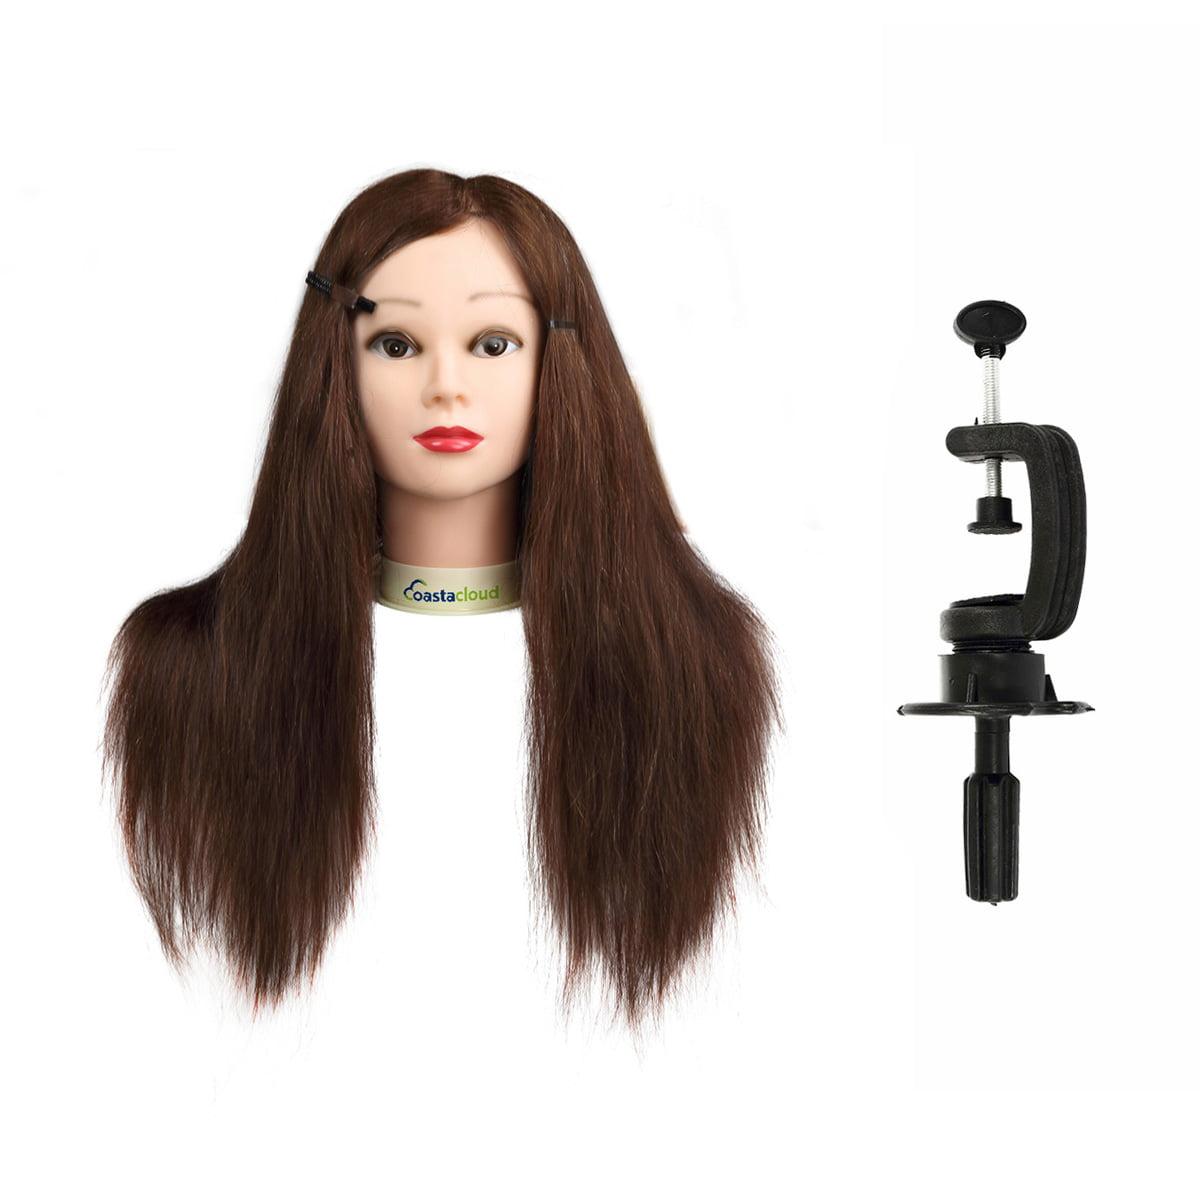 Human Hair 24inch 100% Mannequin Doll Manikin Head + Free Clamp Holder Salon Cosmetology Beauty Head Training Hairdressing Makeup Hairdresser Hair styling Practice CoastaCloud